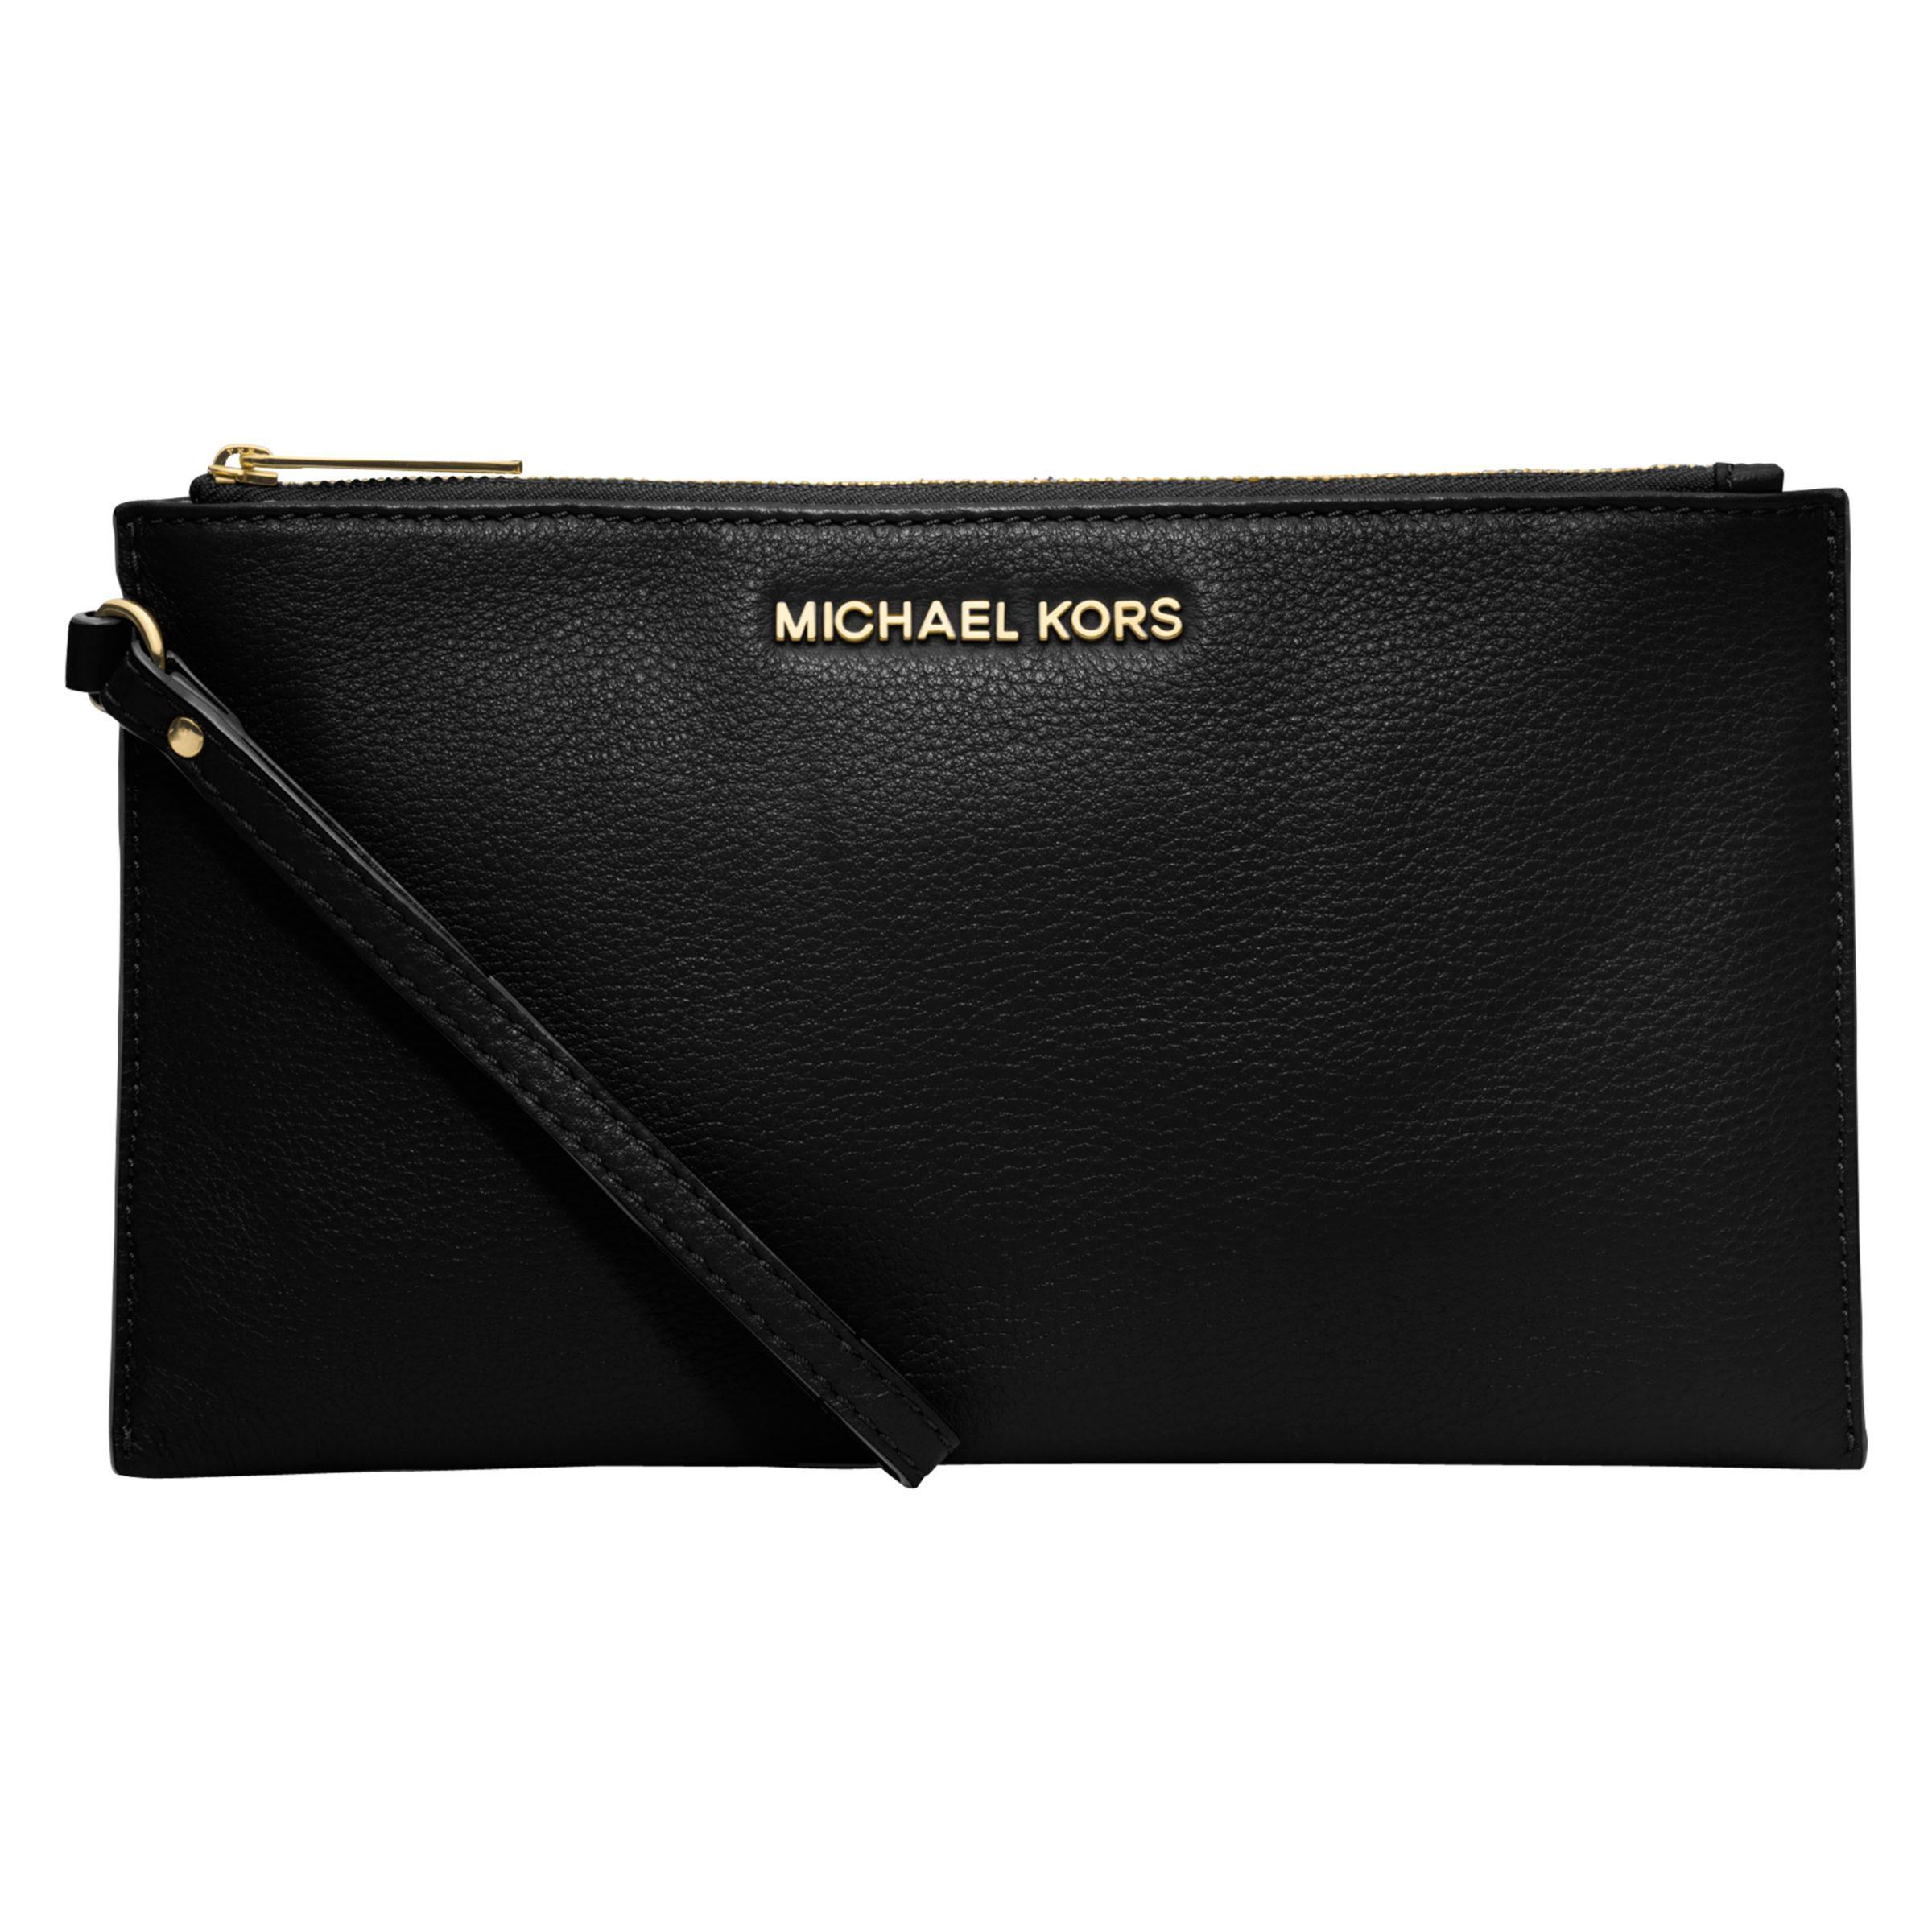 de8866edd0ff MICHAEL Michael Kors Bedford Large Zip Leather Clutch Bag at John Lewis &  Partners